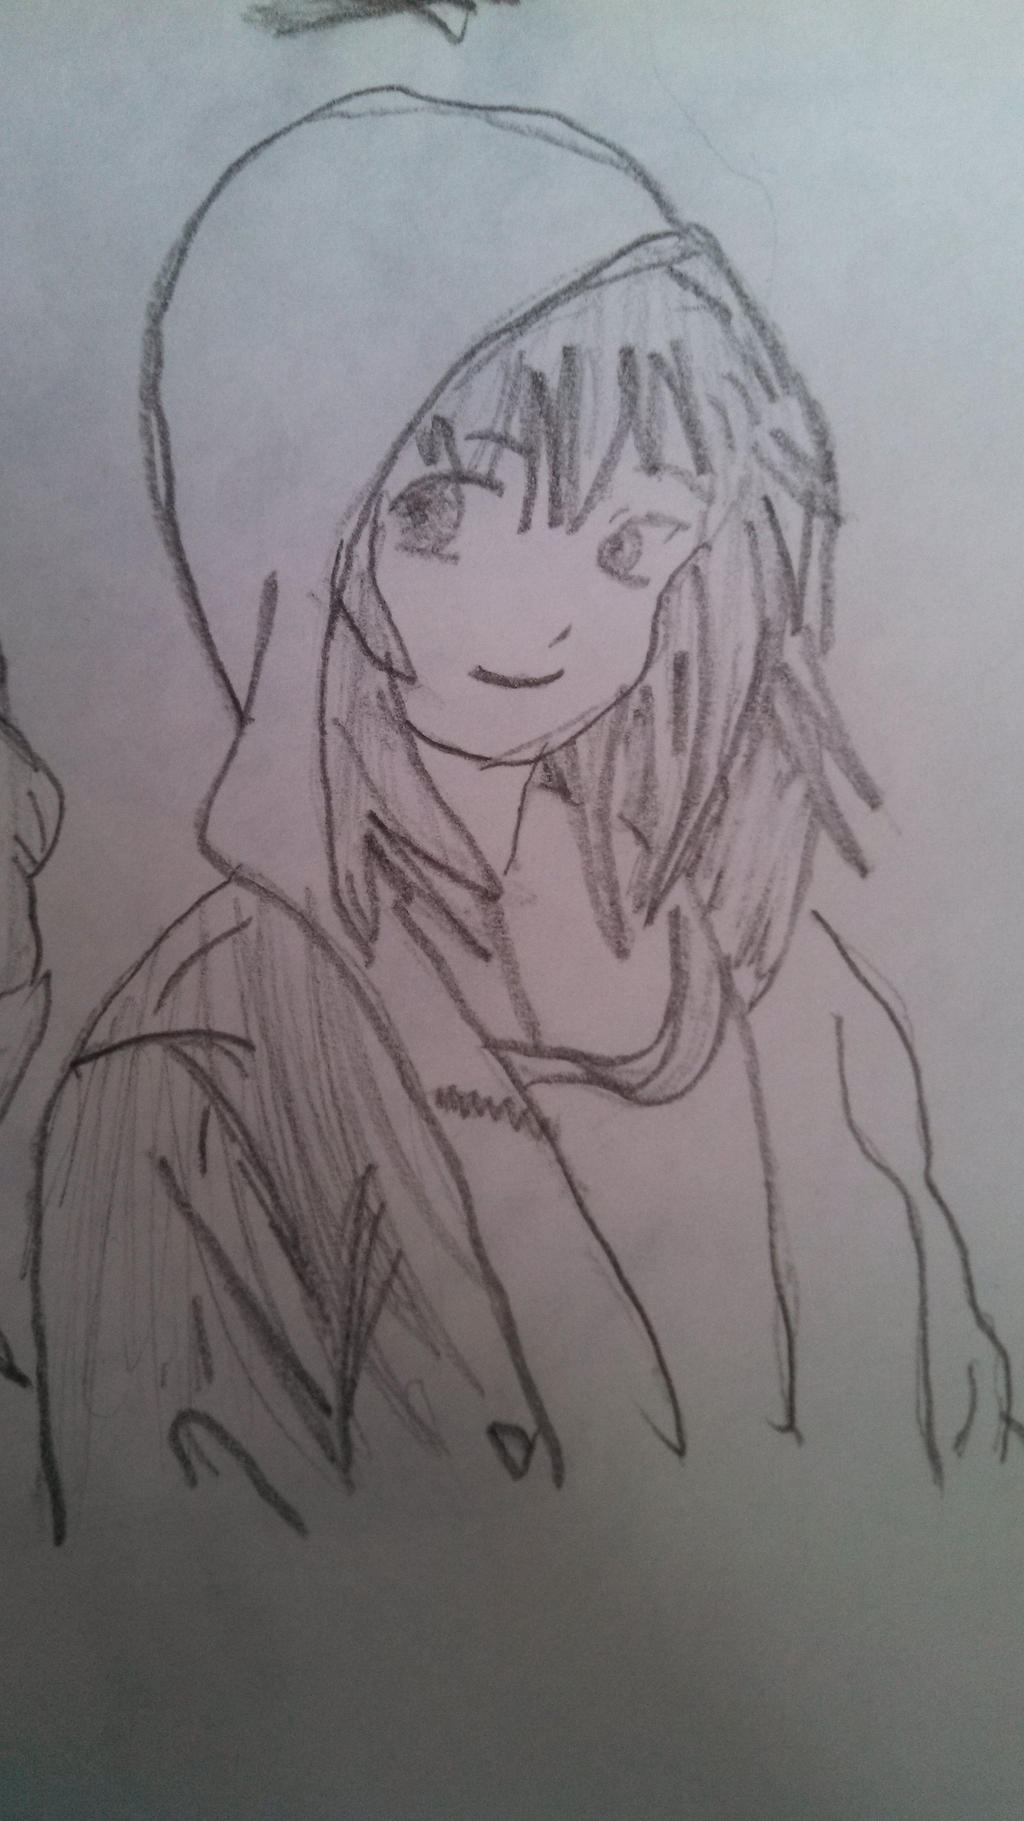 Anime Girl With HoodieHow To Draw Anime Girl With Hoodie